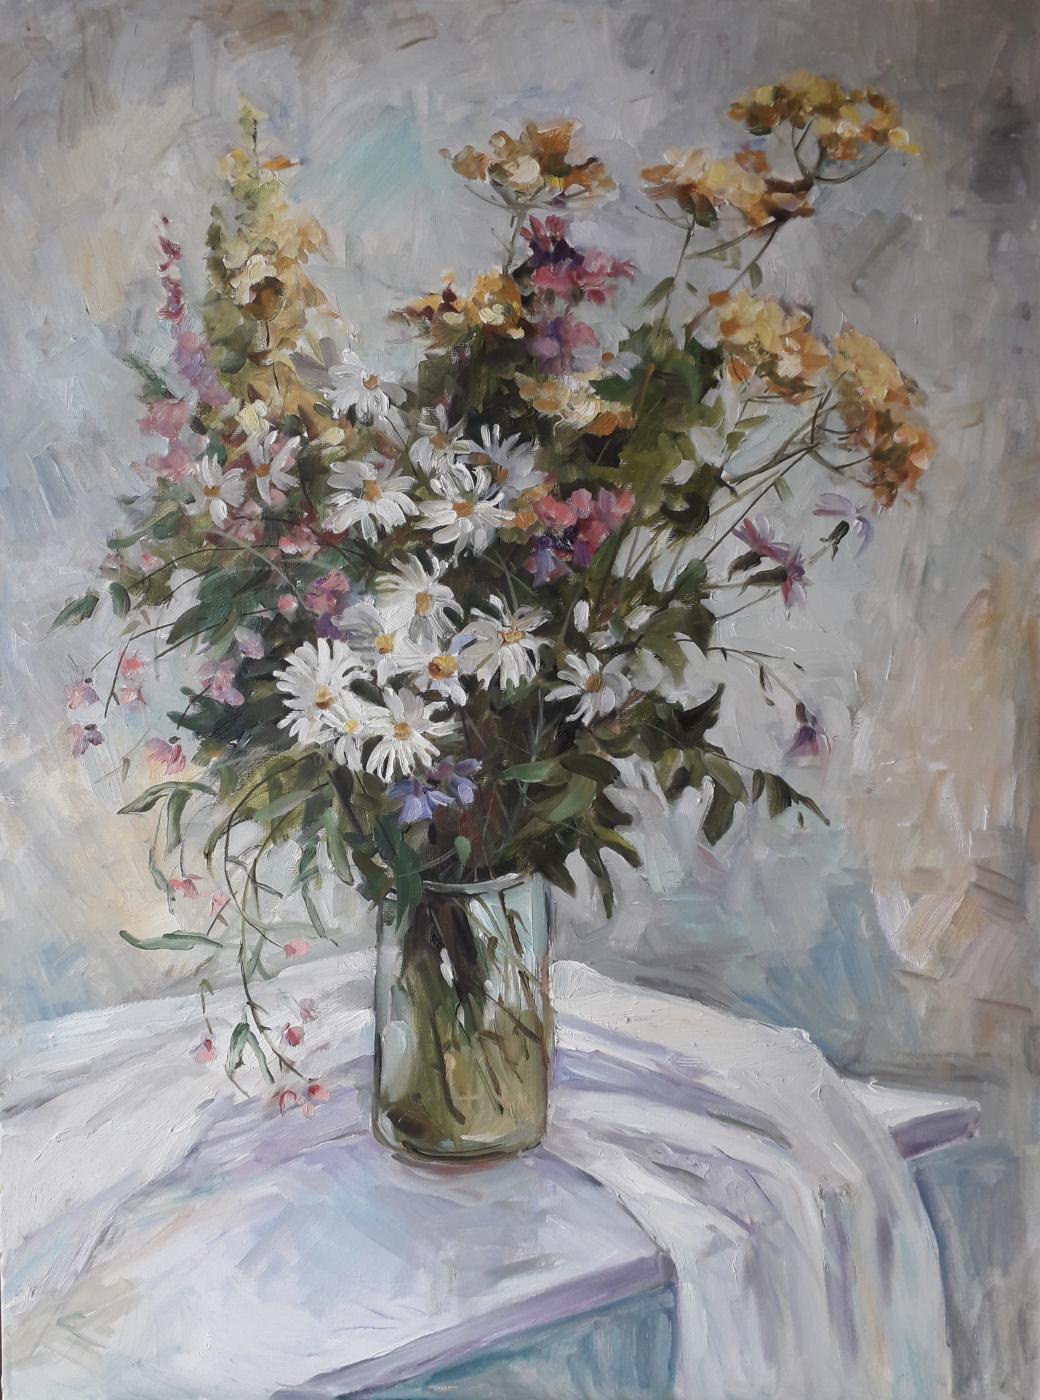 Lyudmila Lvovna Khlebnikova. Bouquet of wildflowers